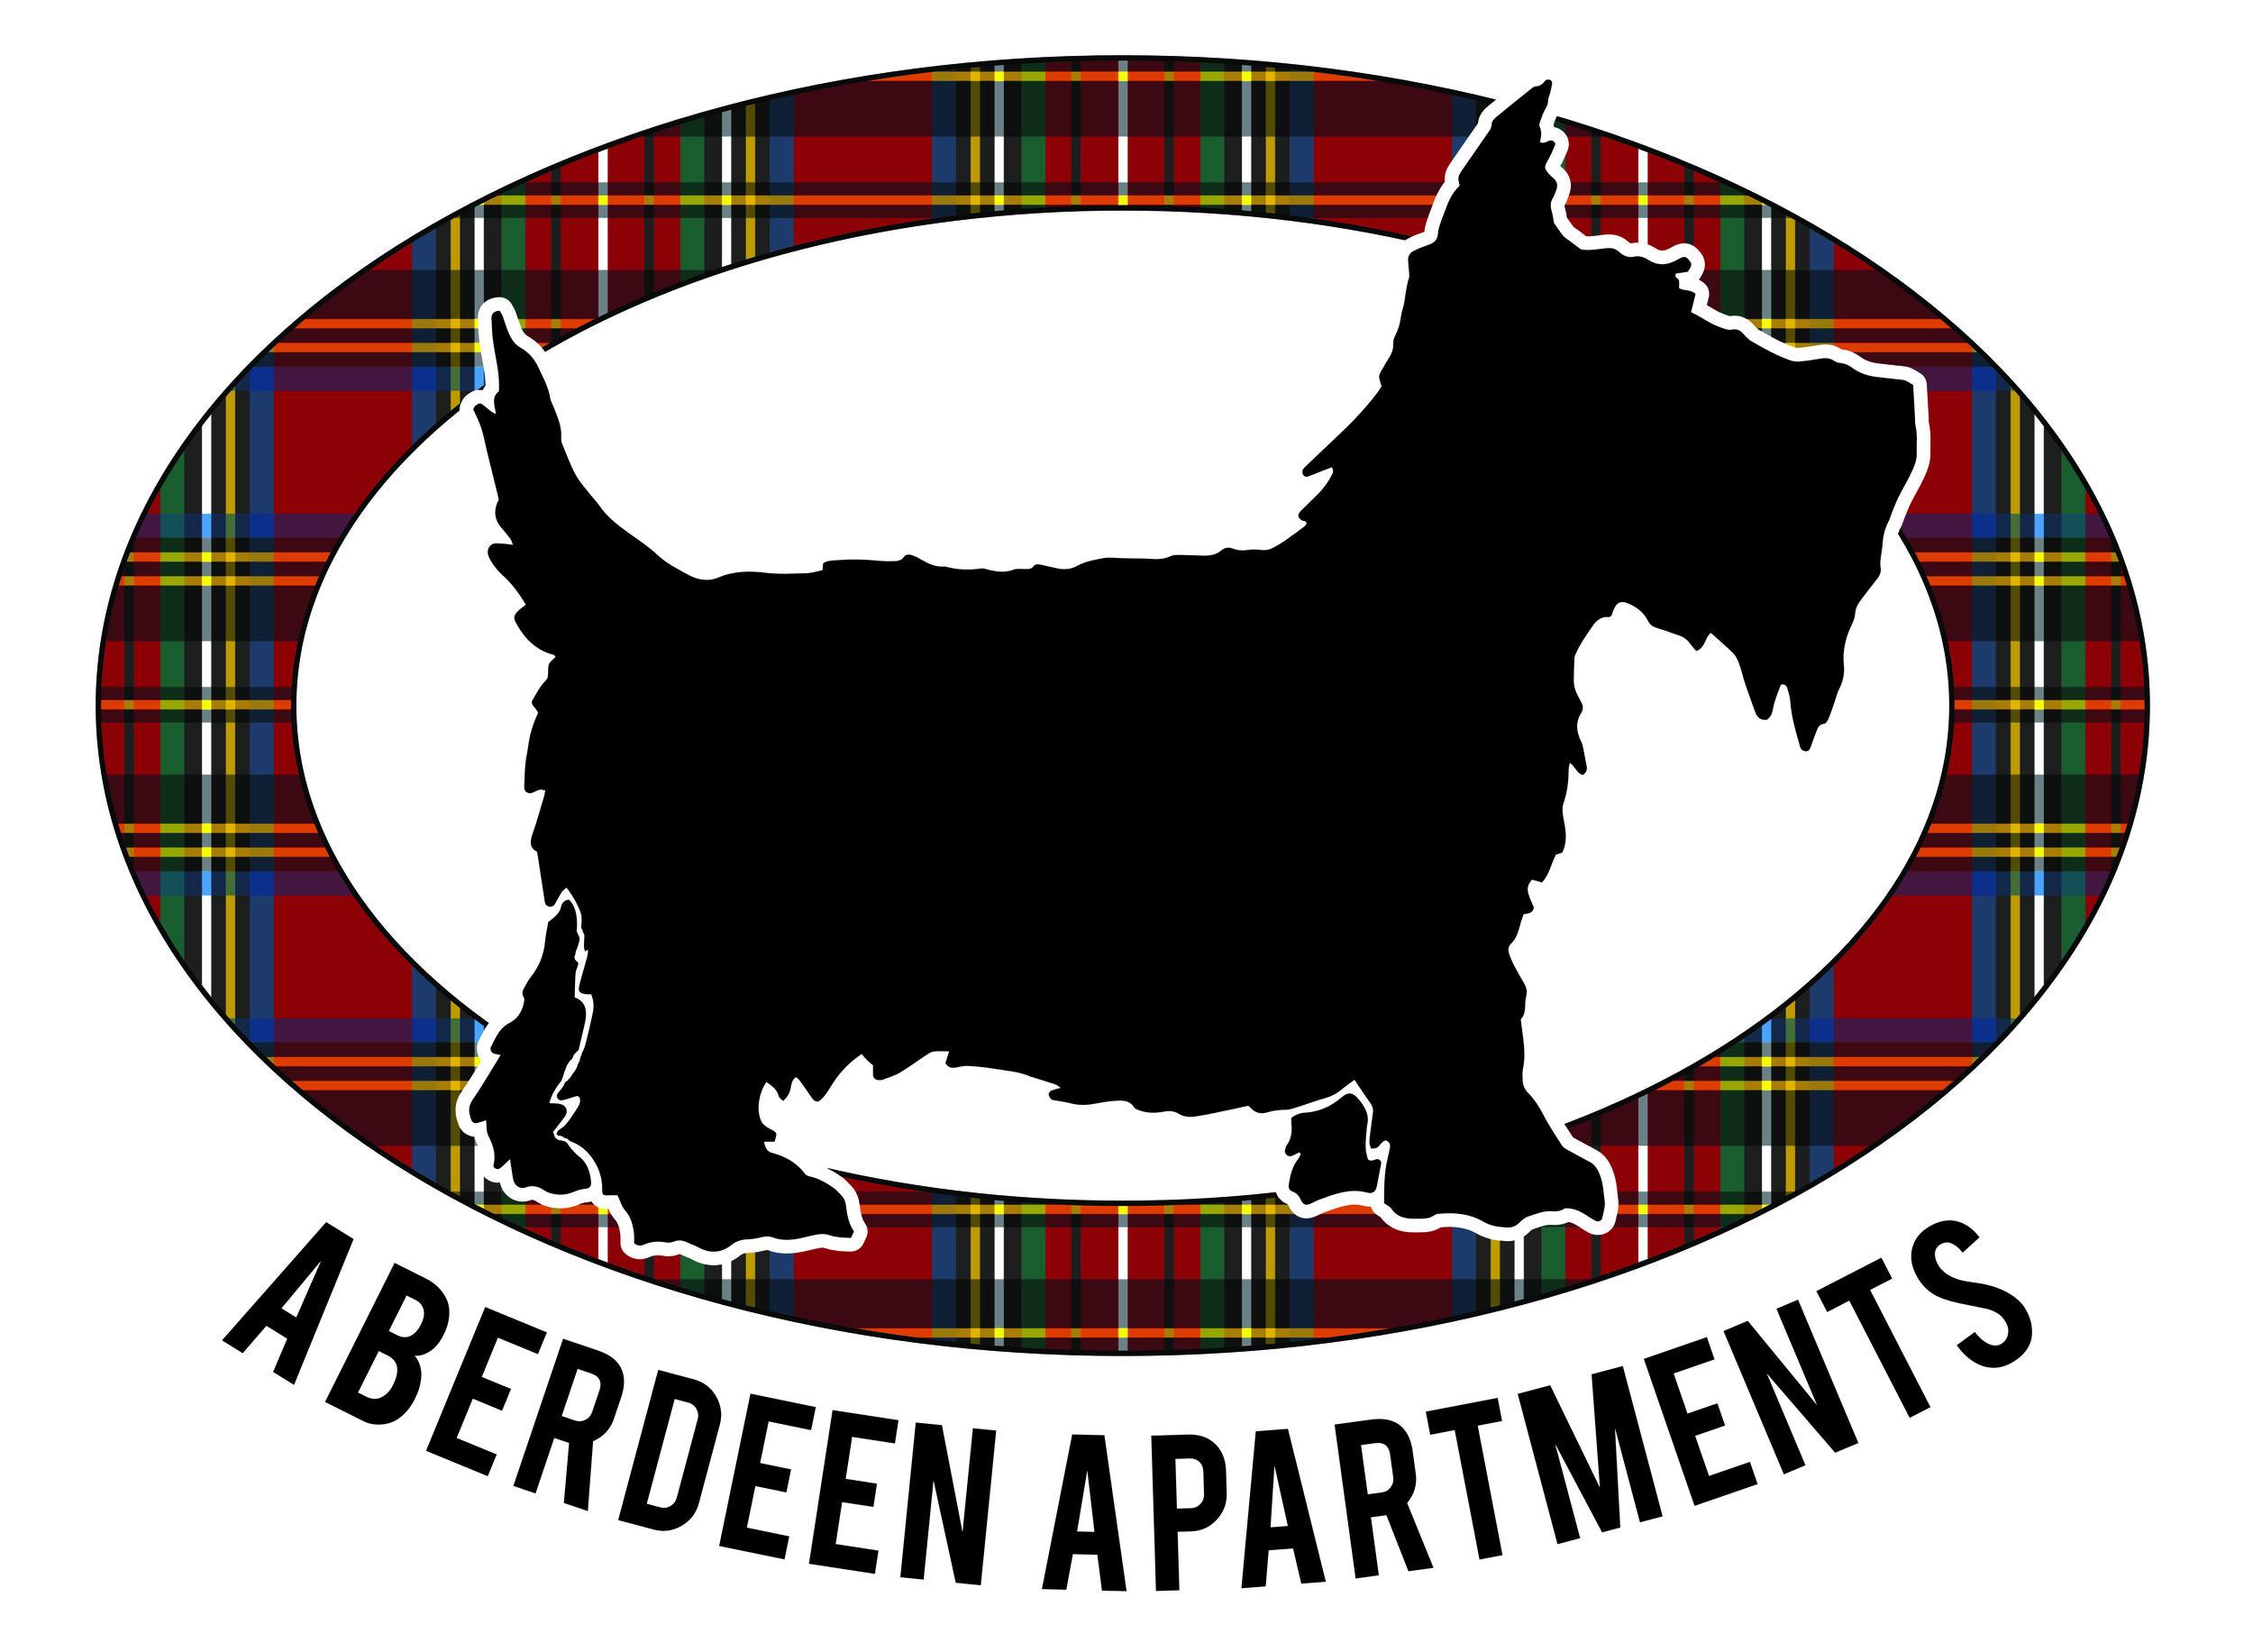 Aberdeen Apartments Madison Wisconsin downtown college UW rent